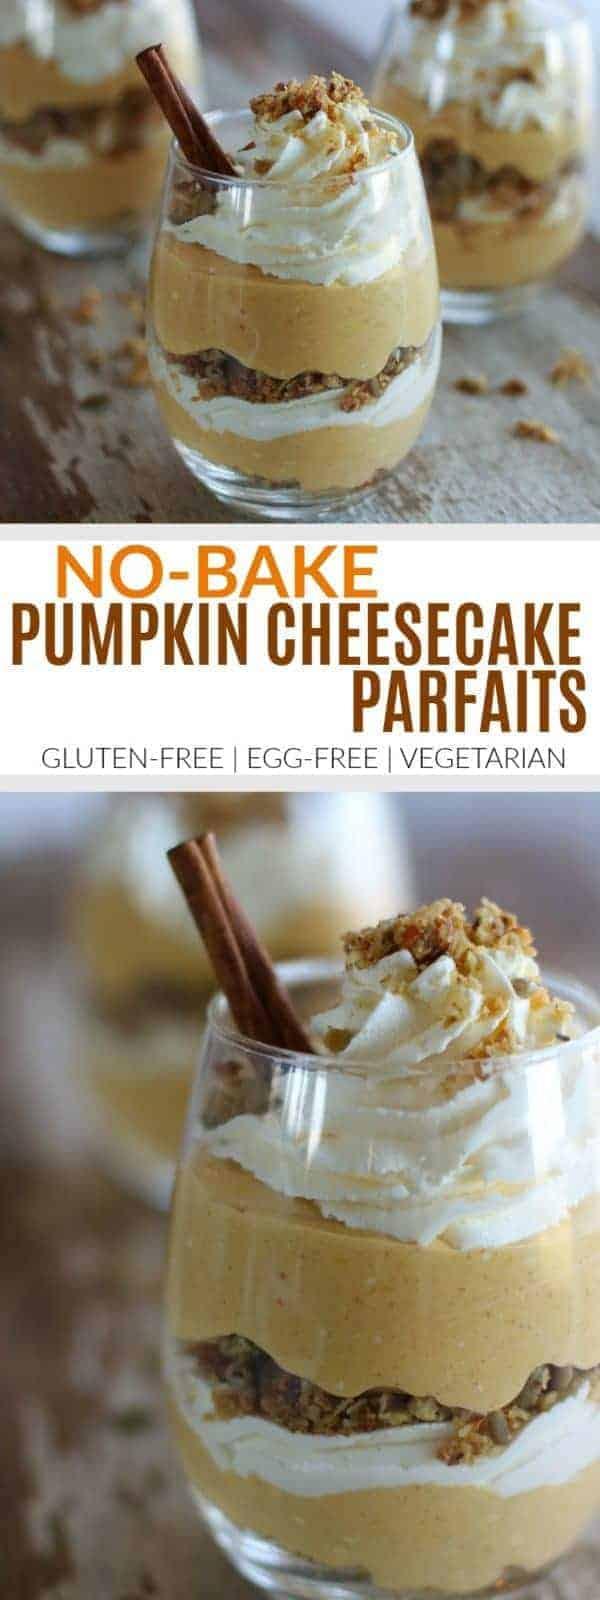 Pinterest image for No-Bake Pumpkin Cheesecake Parfaits